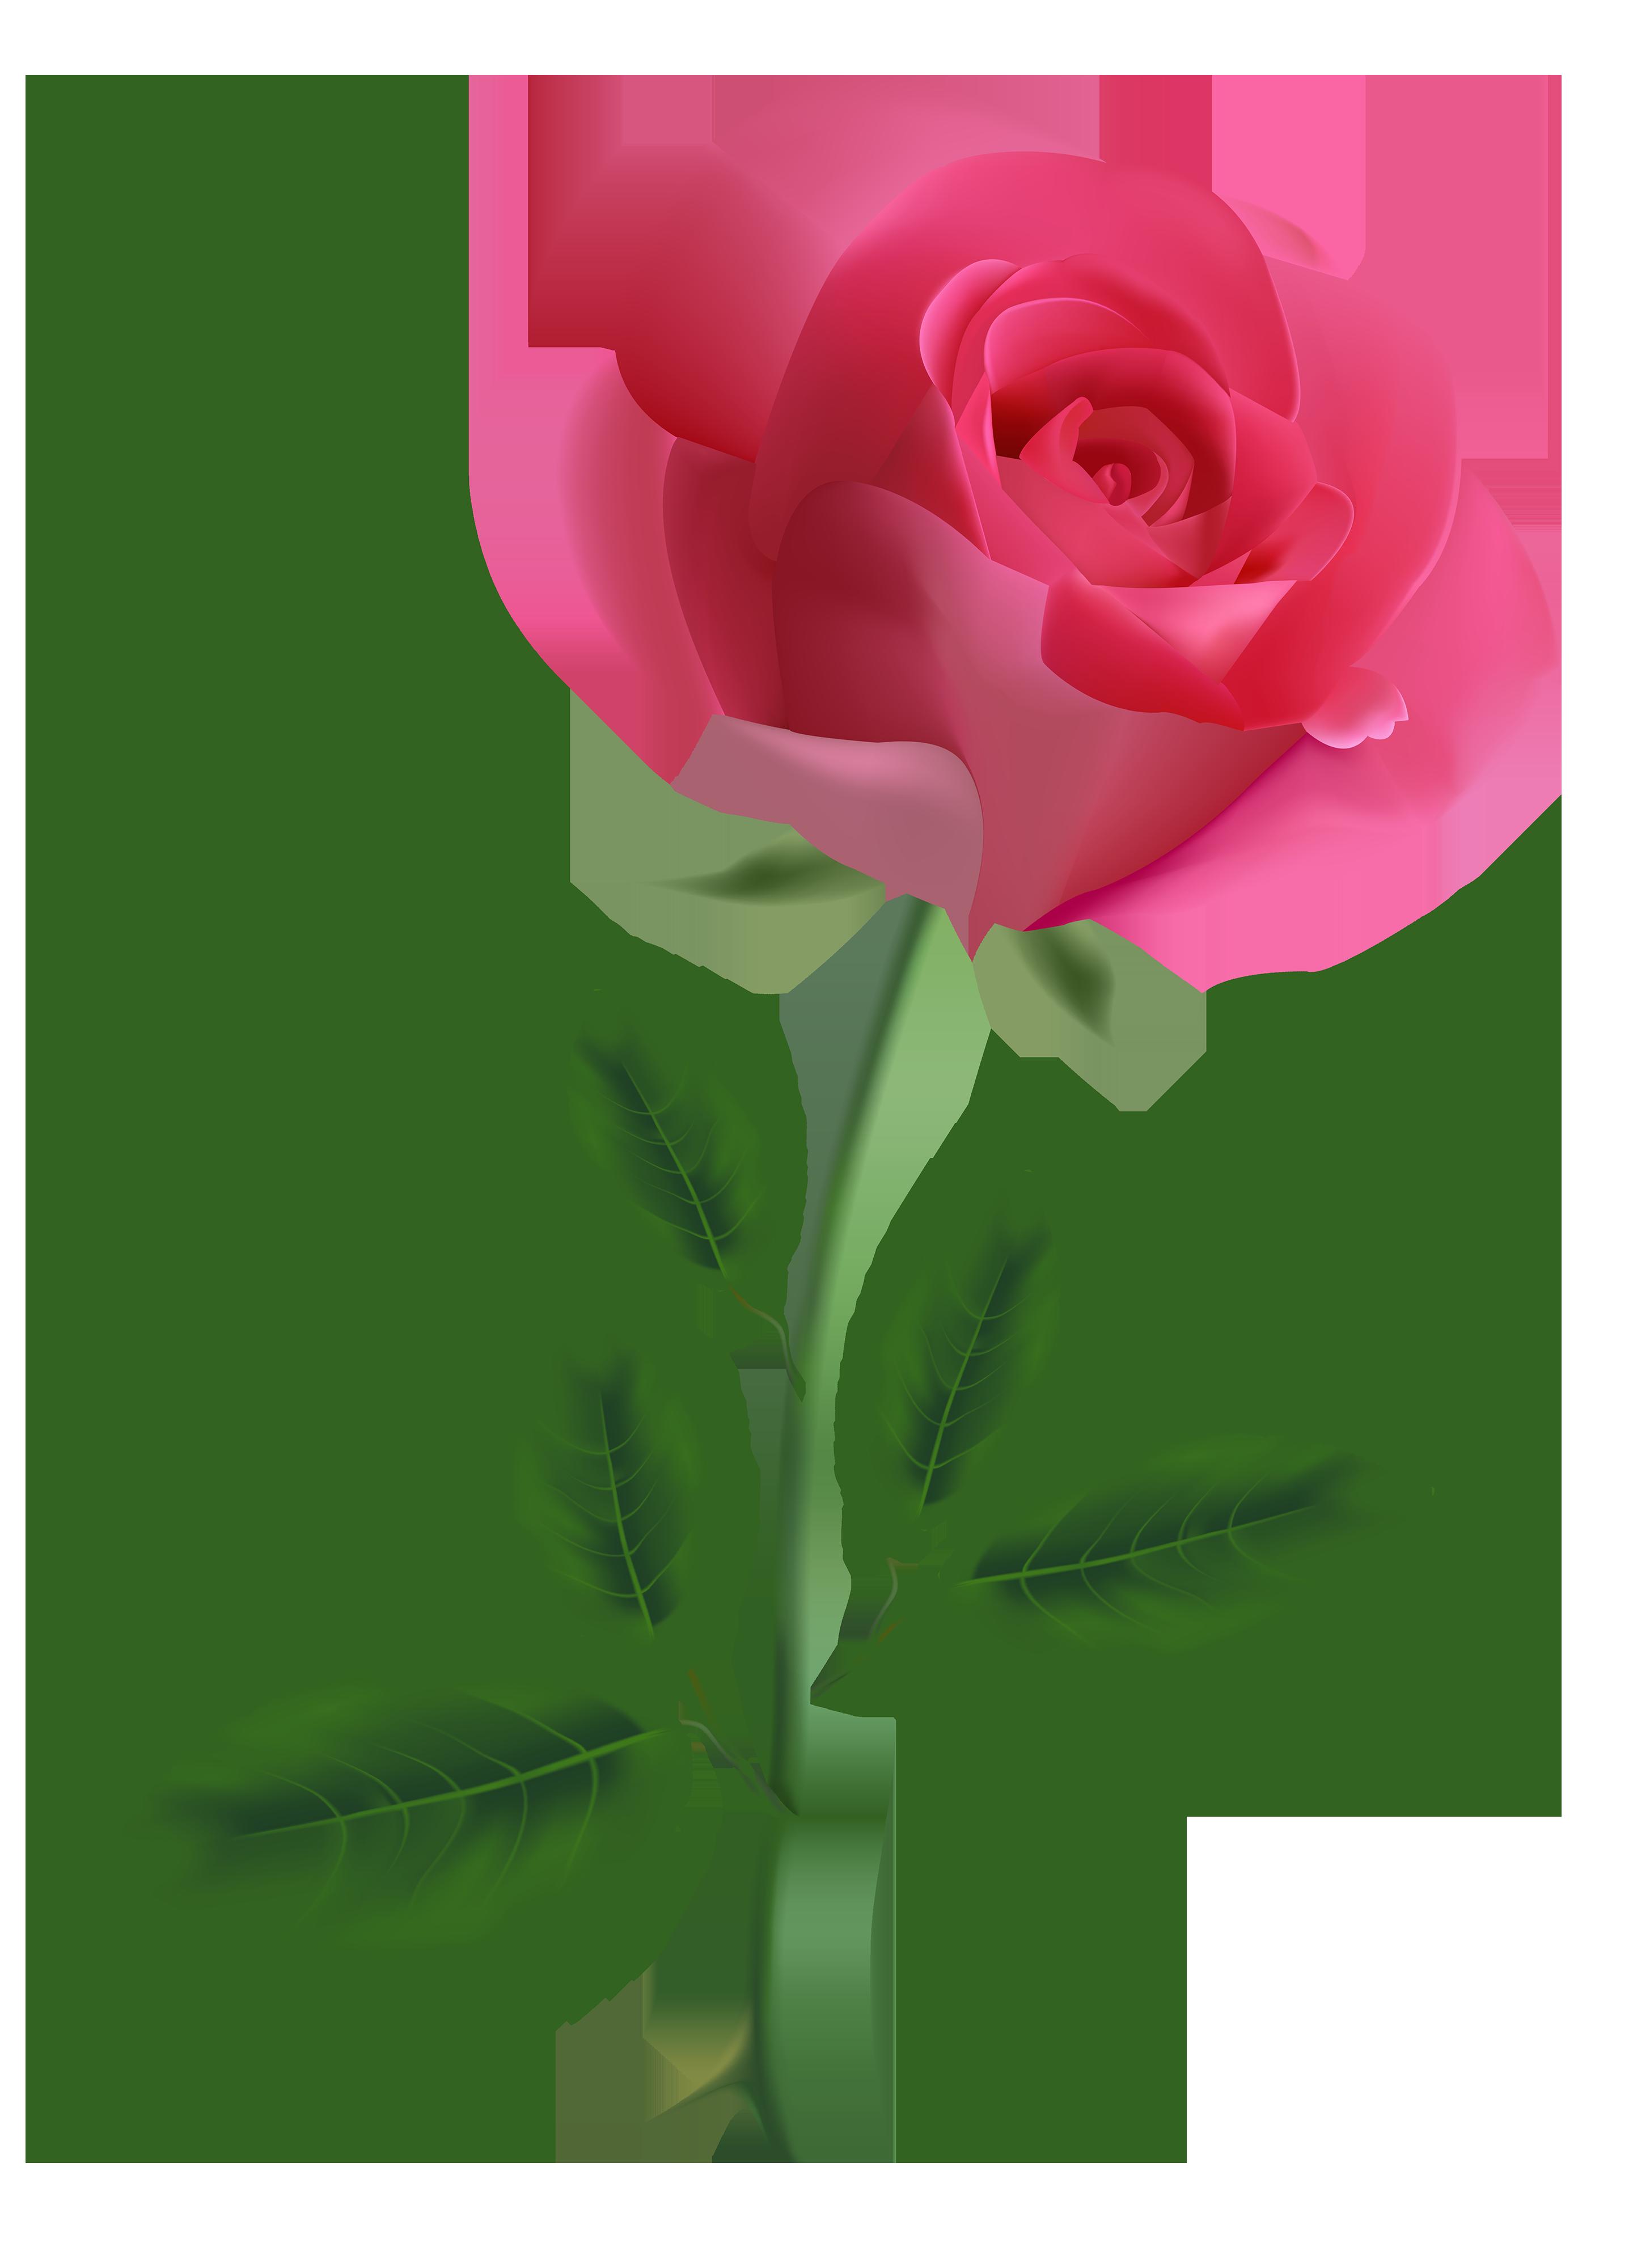 Pink rose clipart image. Single flower png